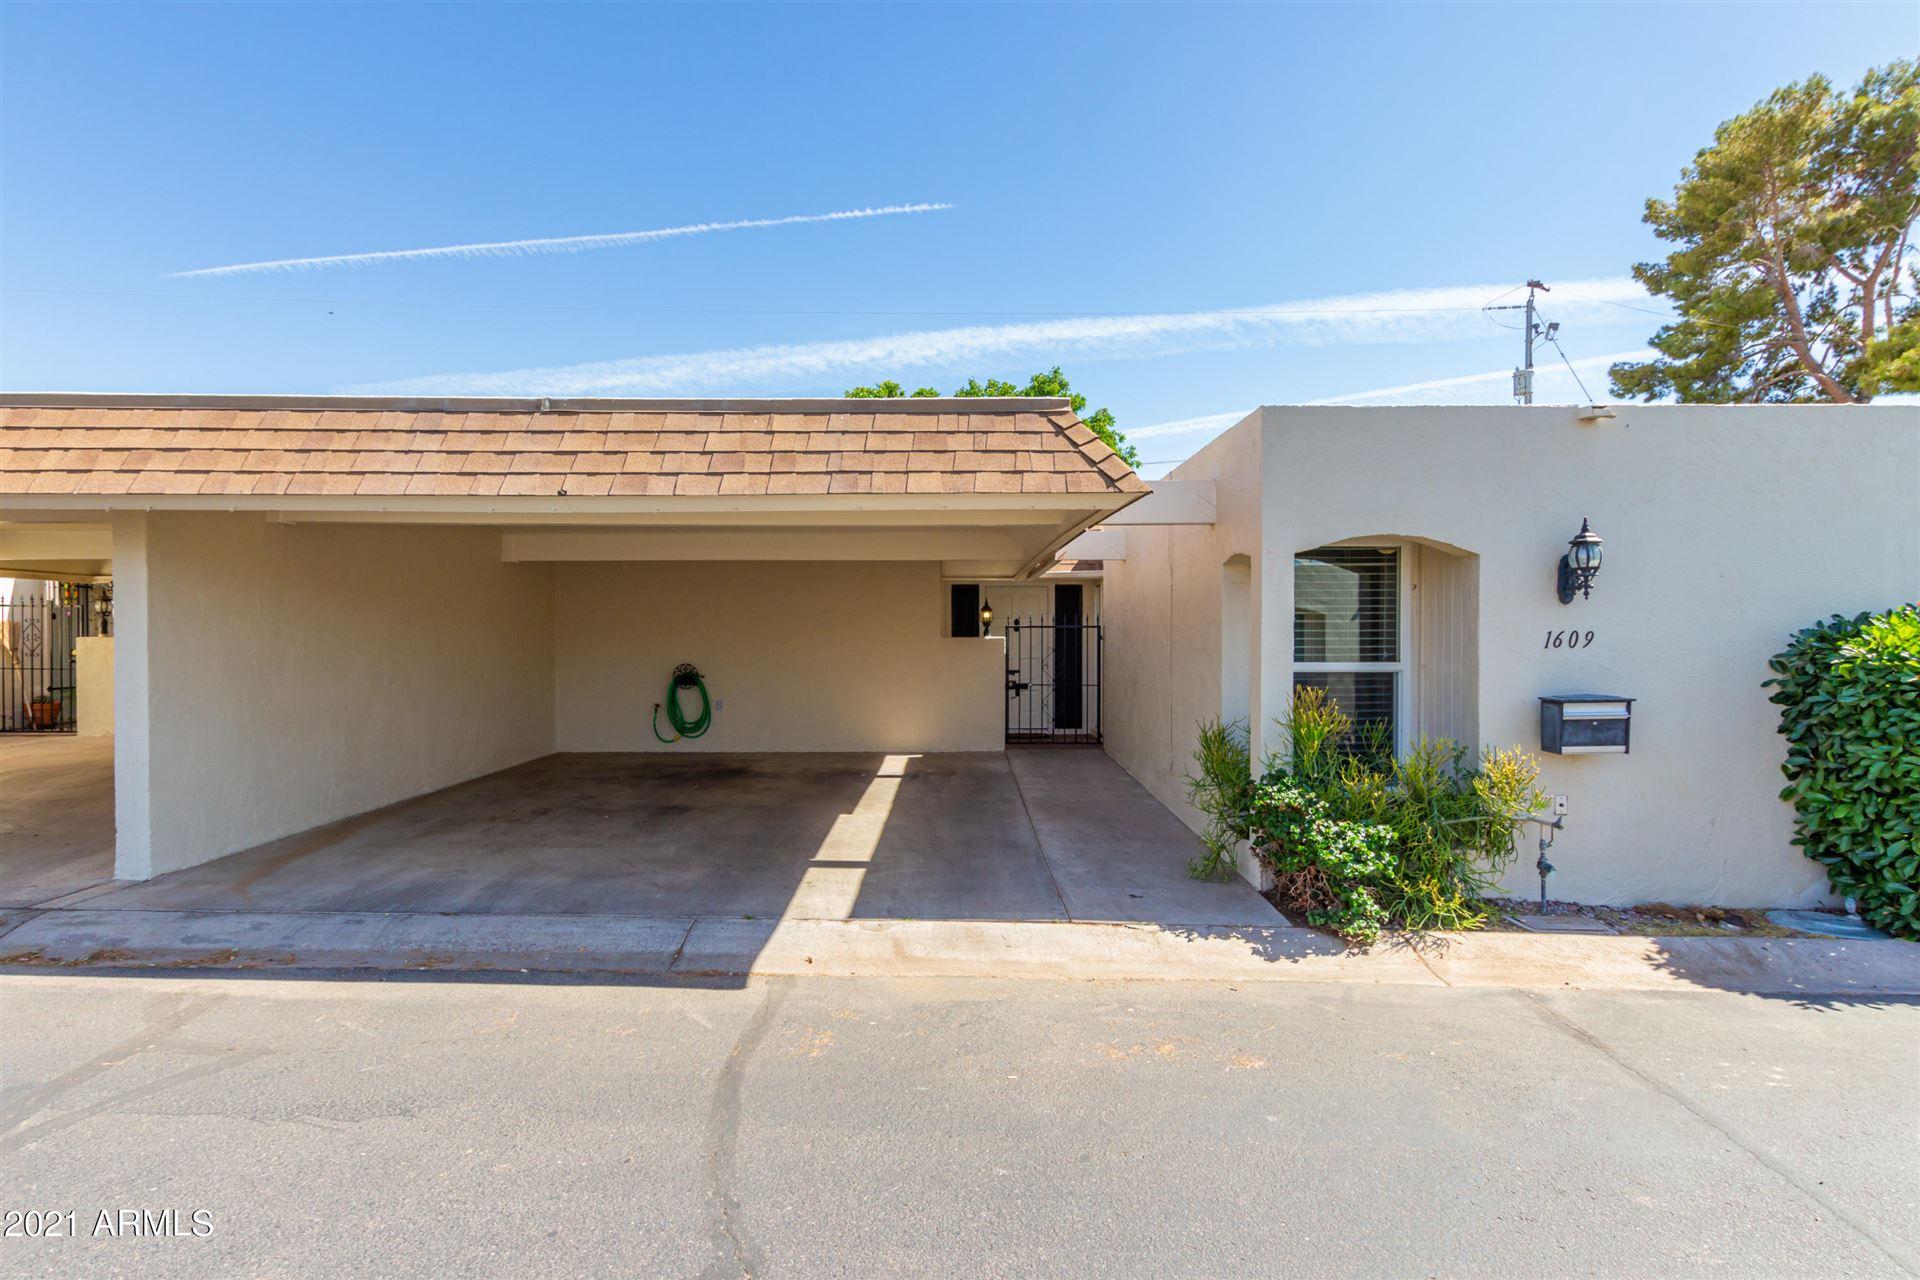 1609 E BORGHESE Place, Phoenix, AZ 85016 - MLS#: 6233065